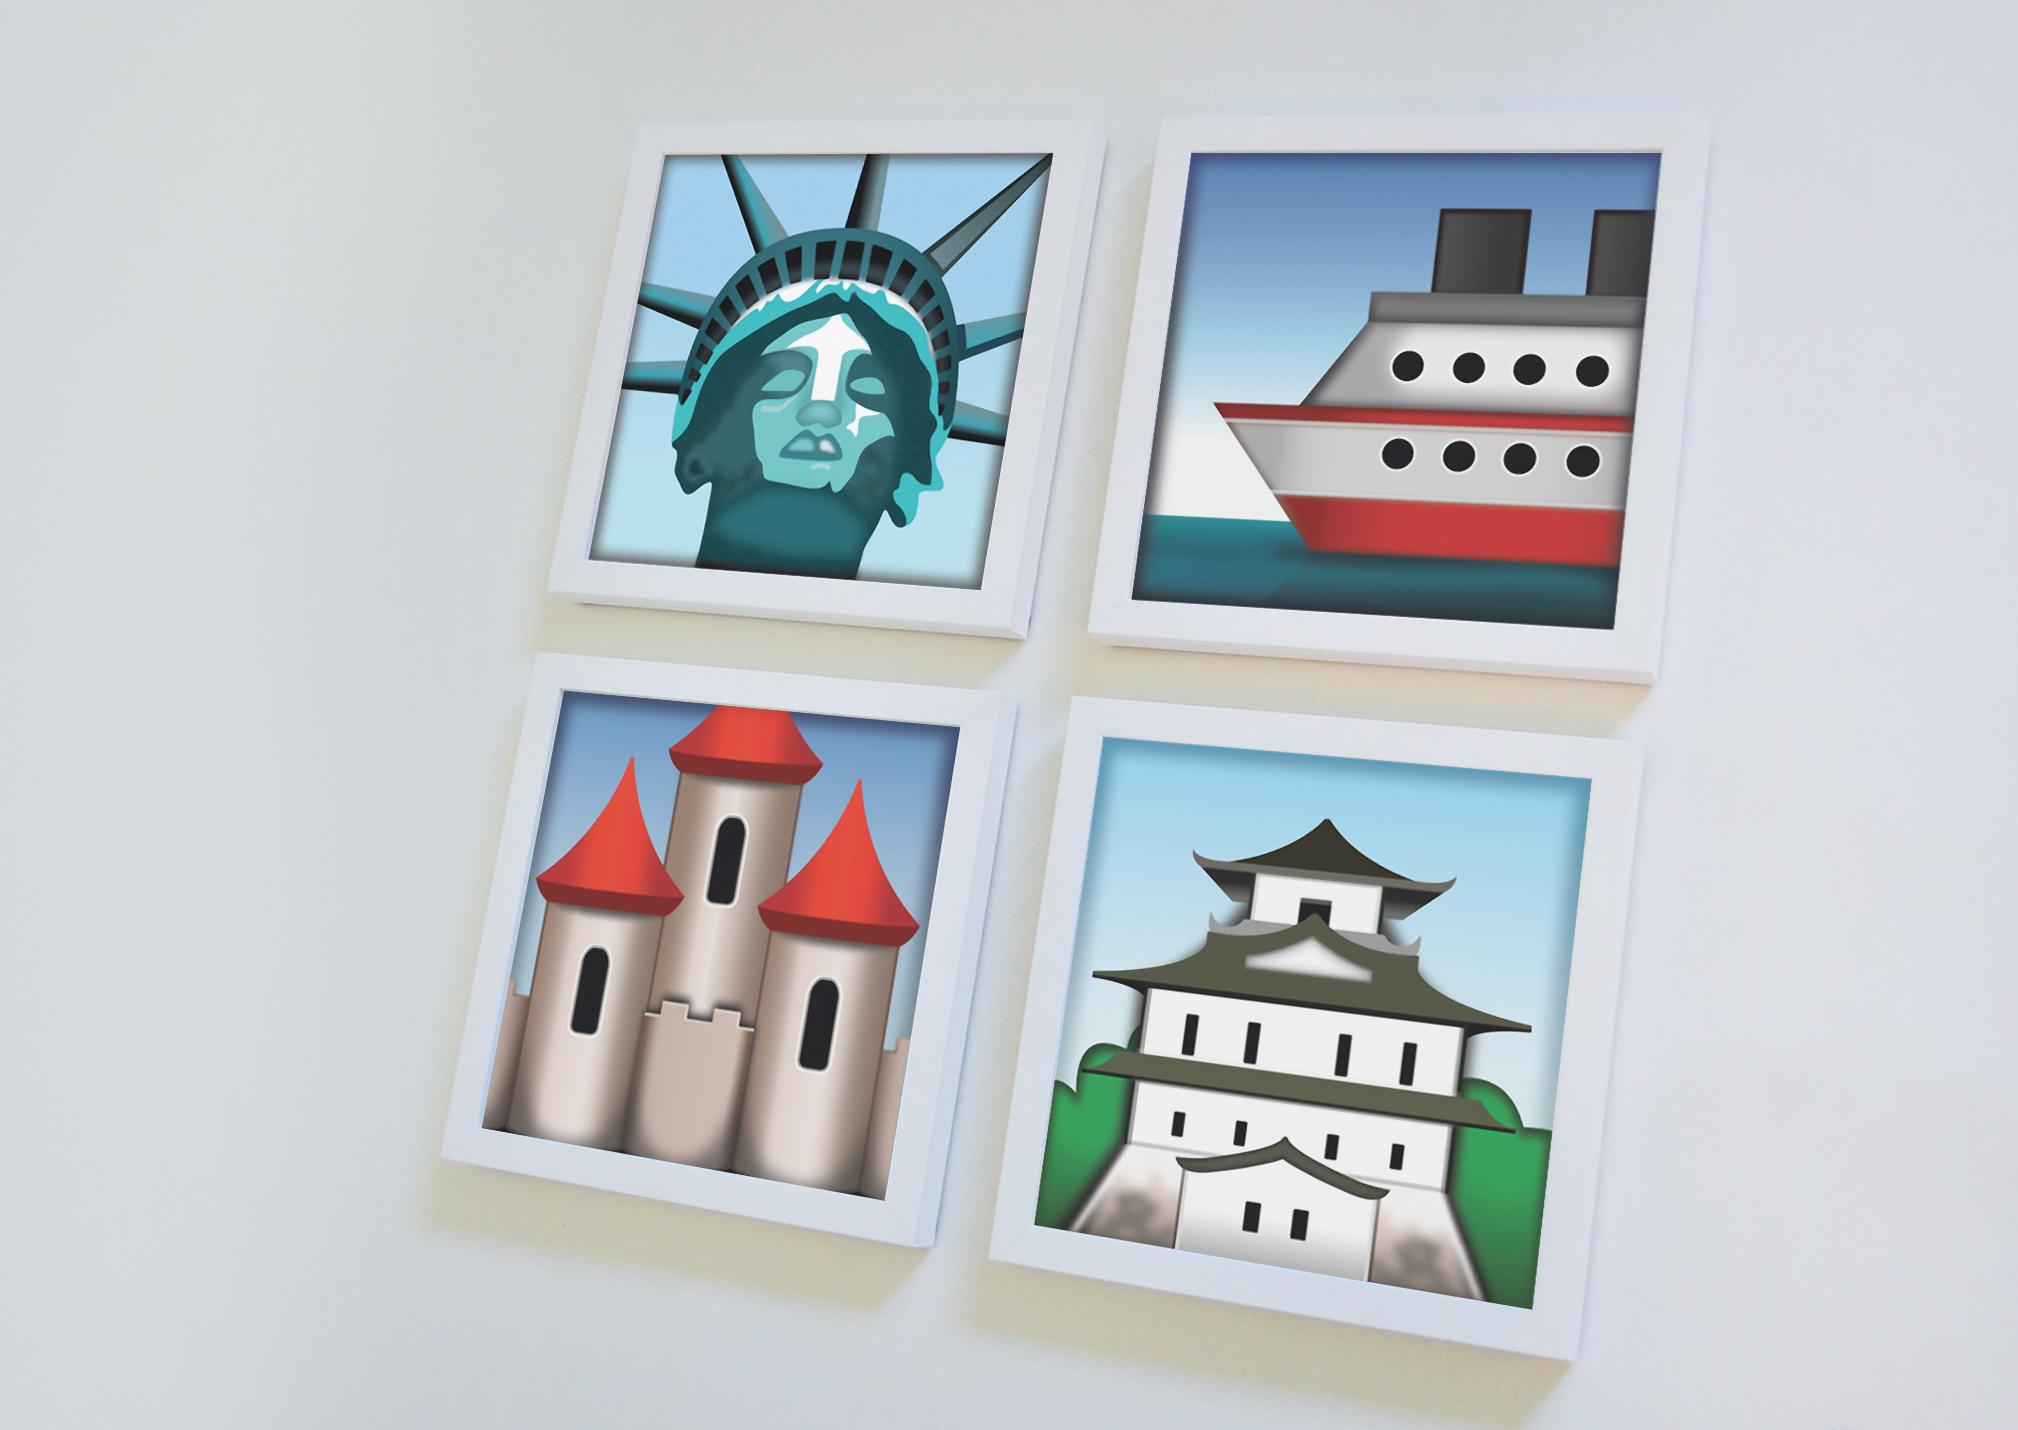 Emoji_Frames_Monuments_Matthew_LaPenta.jpg